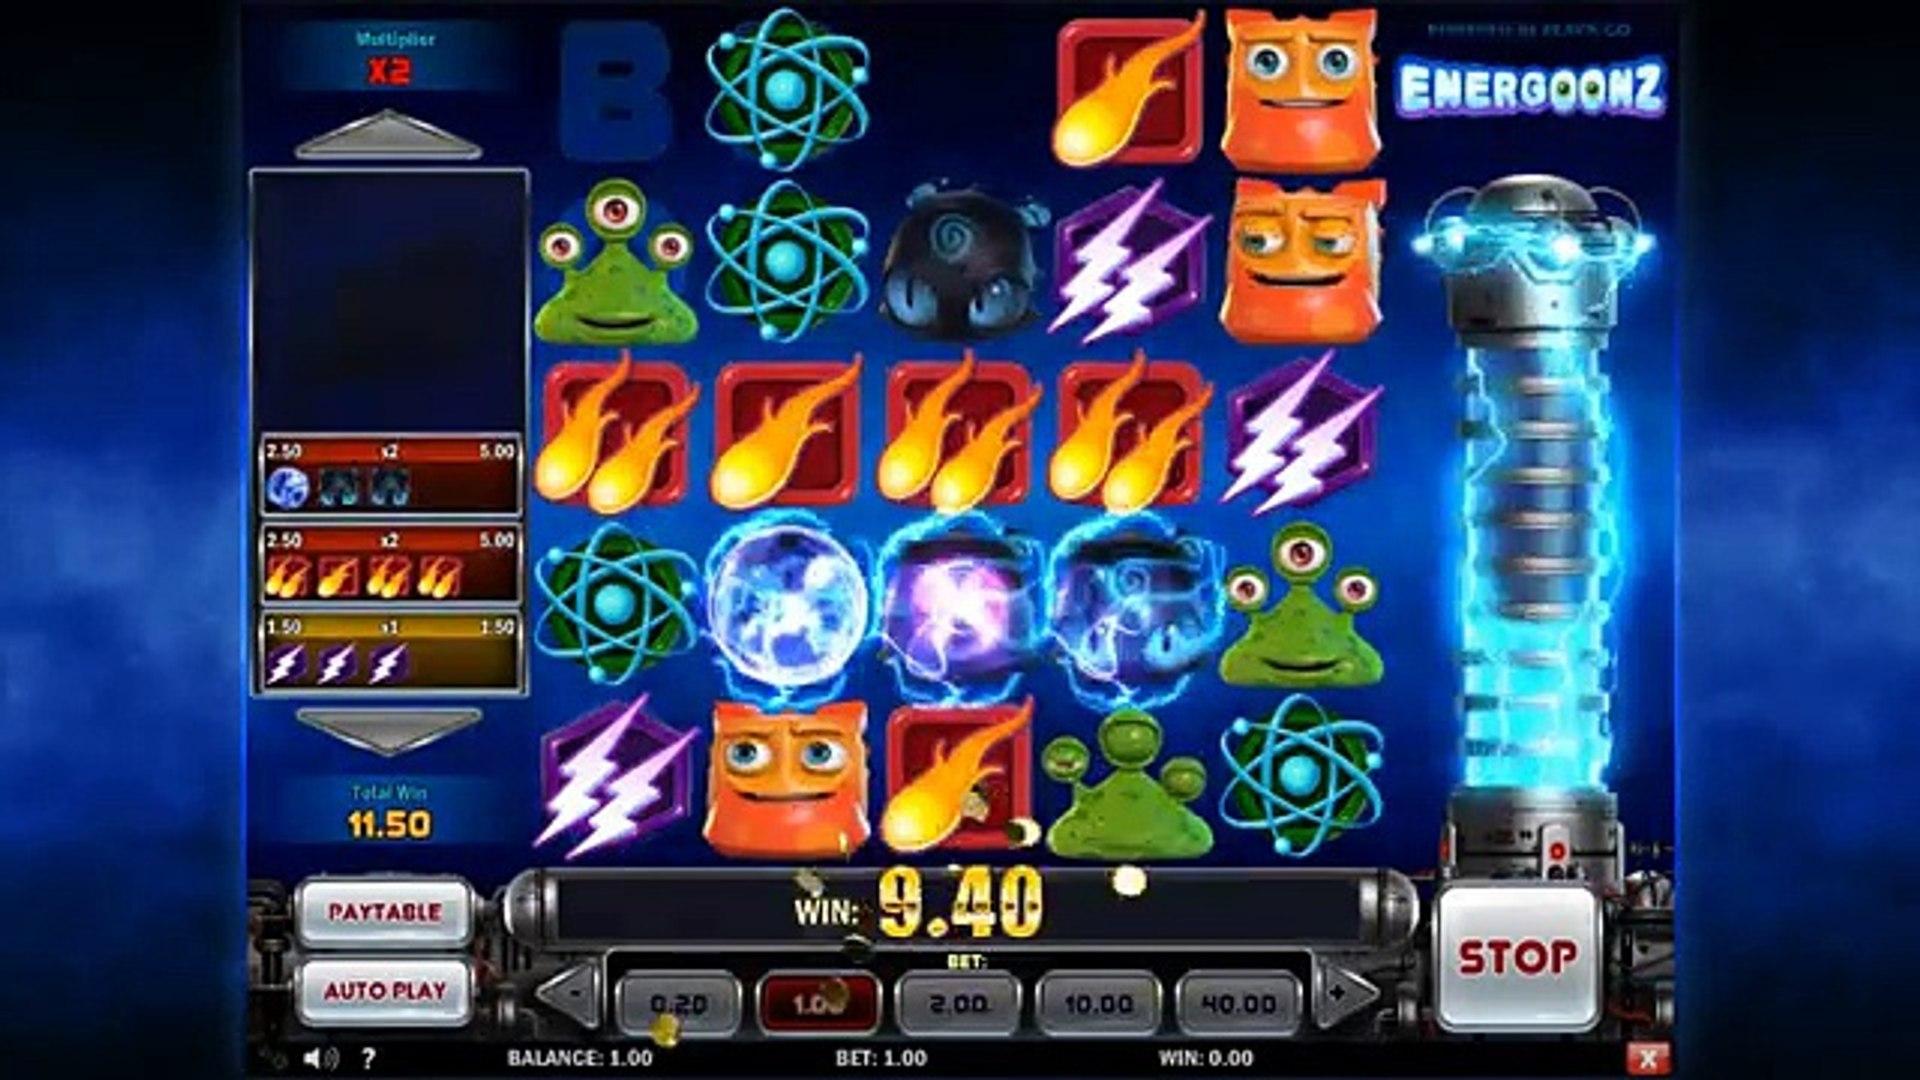 Energoonz slot machine casino gratis online game